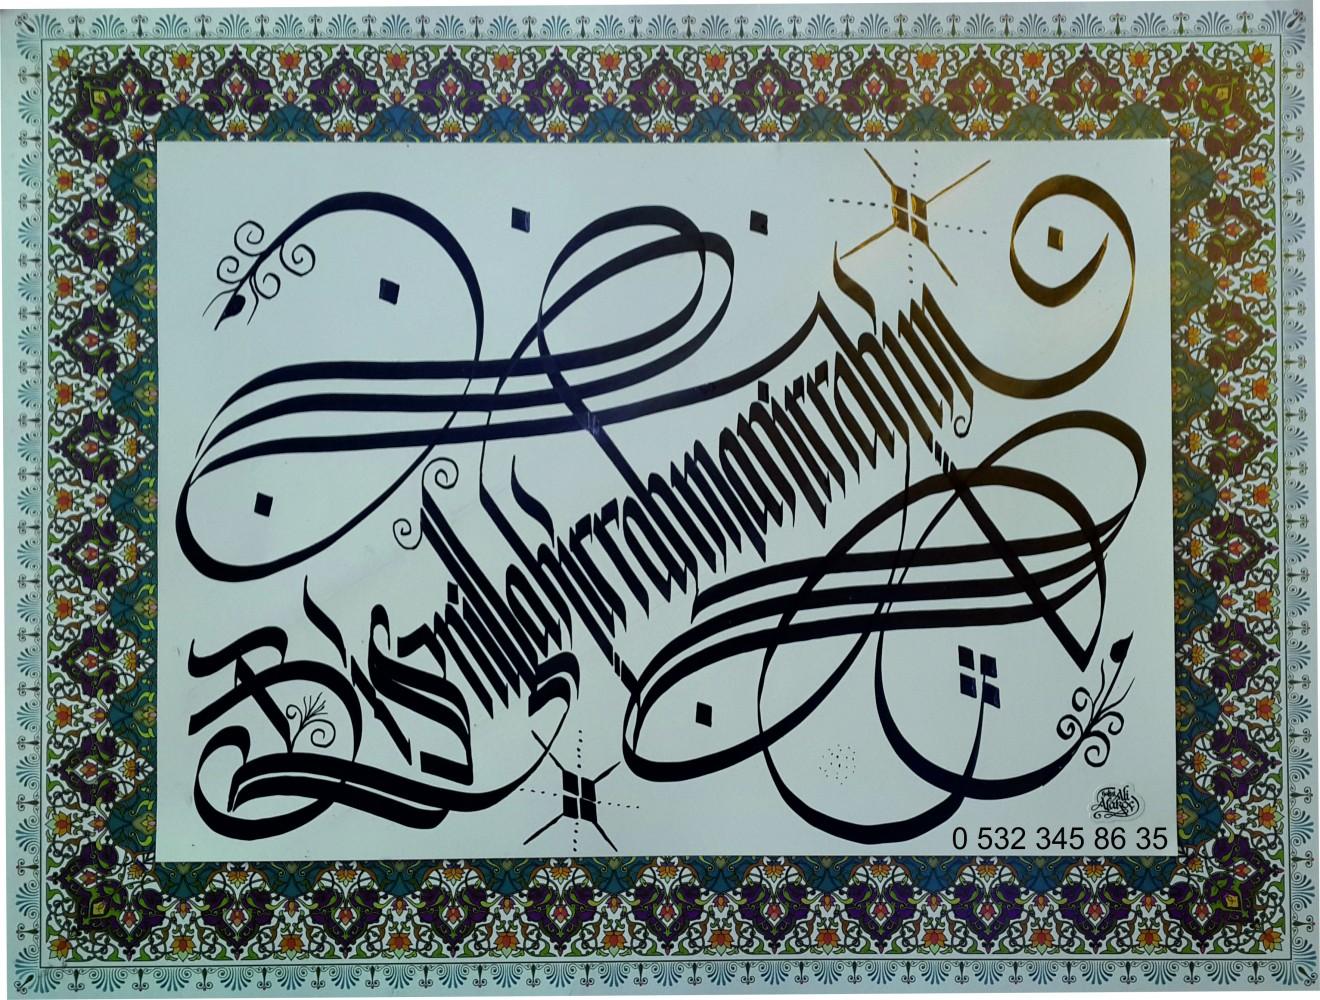 HAT SANATKARI,ankara hattat,hattat,ankara hattat,ankara kaligrafi,ankara kaligrafi merkezi,ankara hat merkezi,ankarada hatattatlar,ankarada kaligraflar,kaligraf ankara,kaligrafi kursu,hat sanatı kurslerı,hat öğrenmek istiy